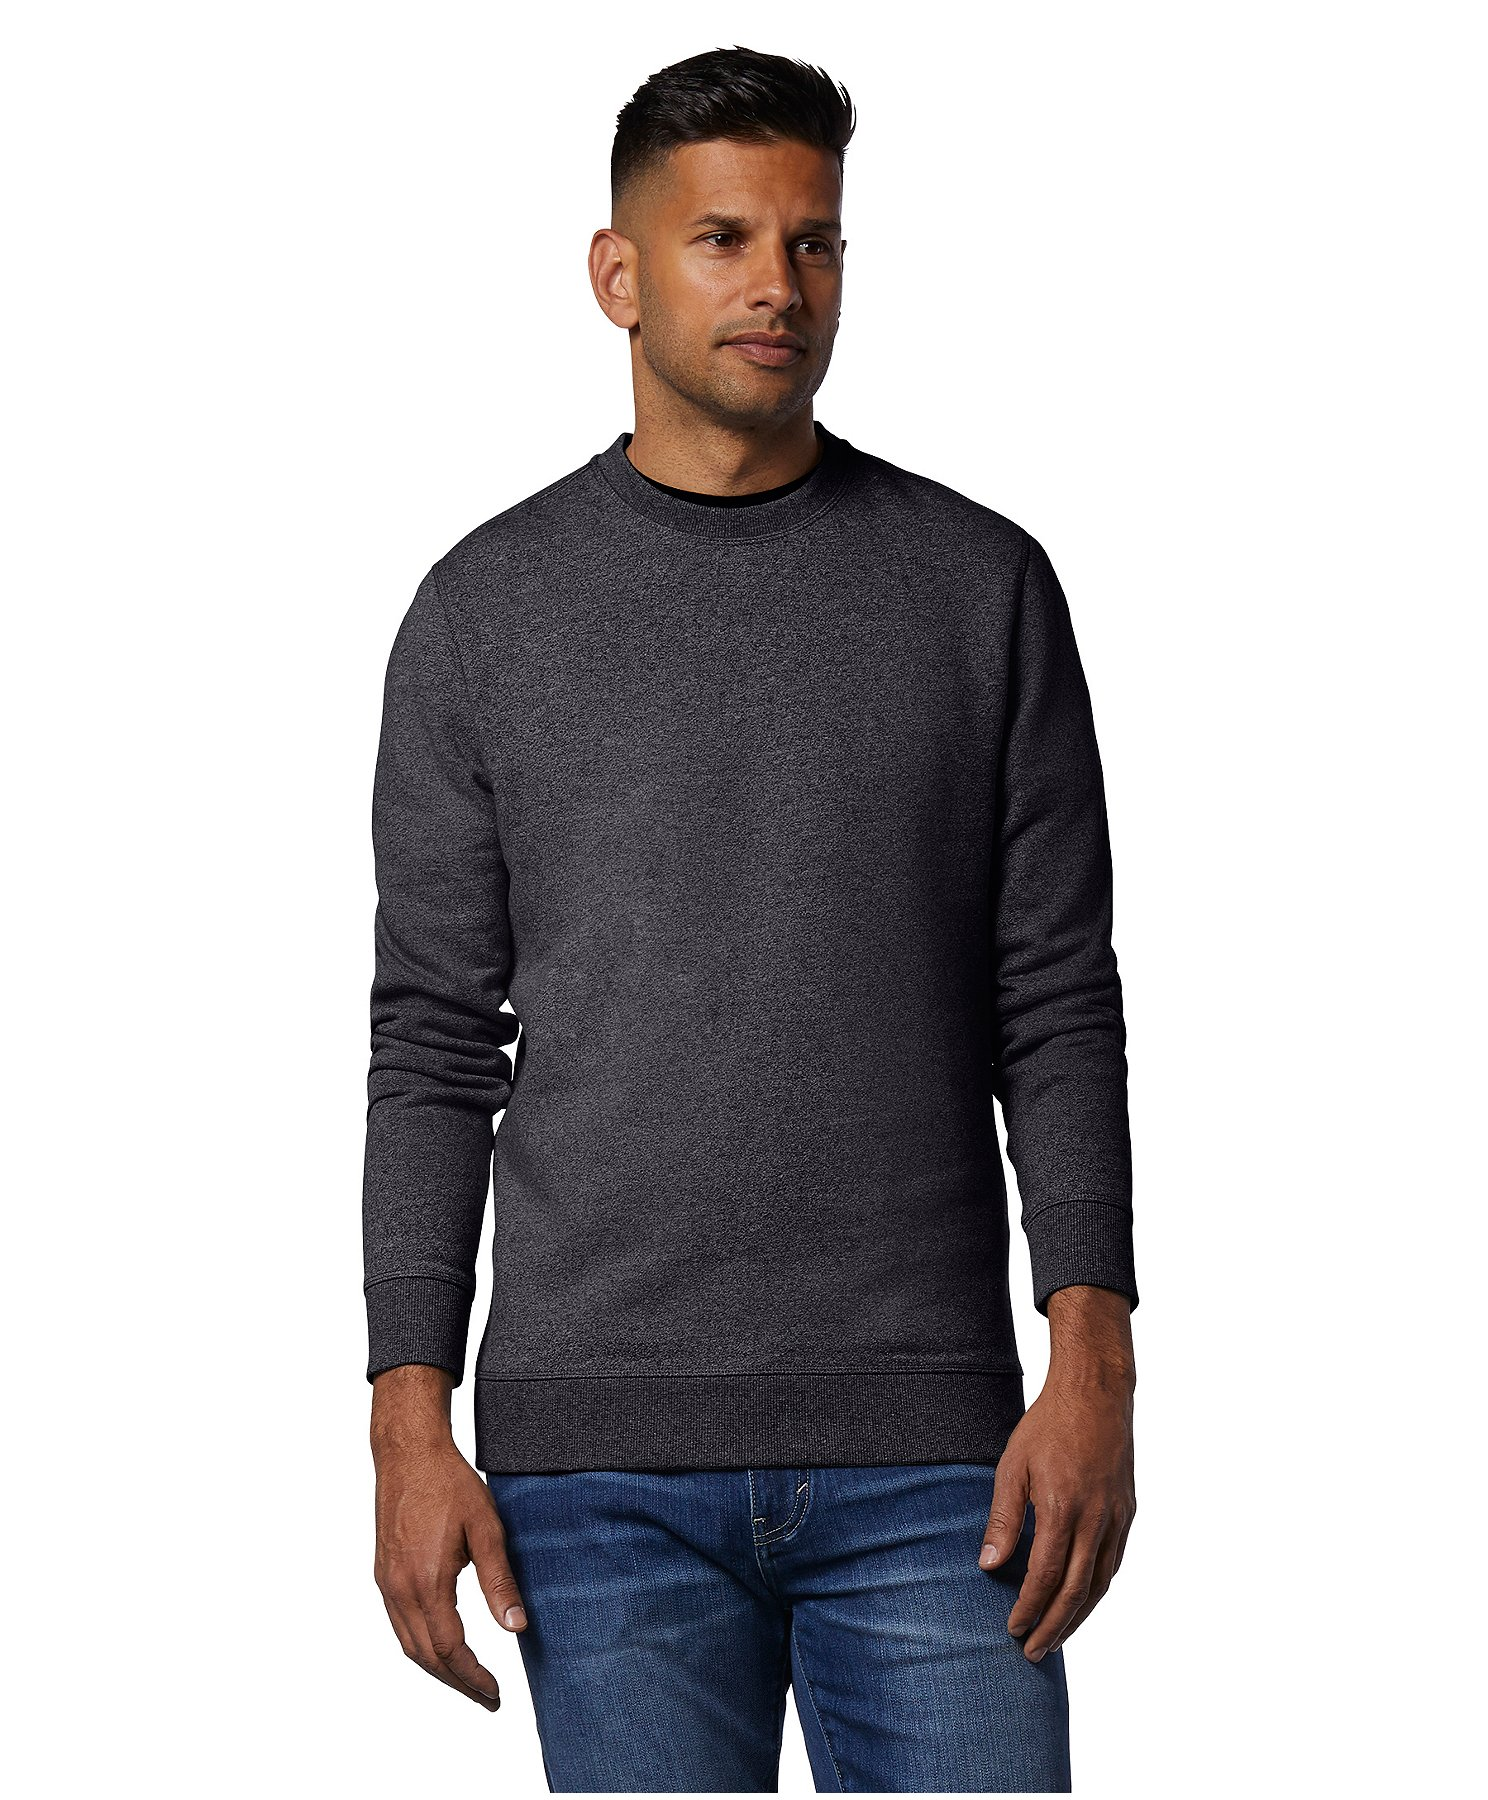 Have It Tall Mens Tall T Shirt Soft Blend Fabric